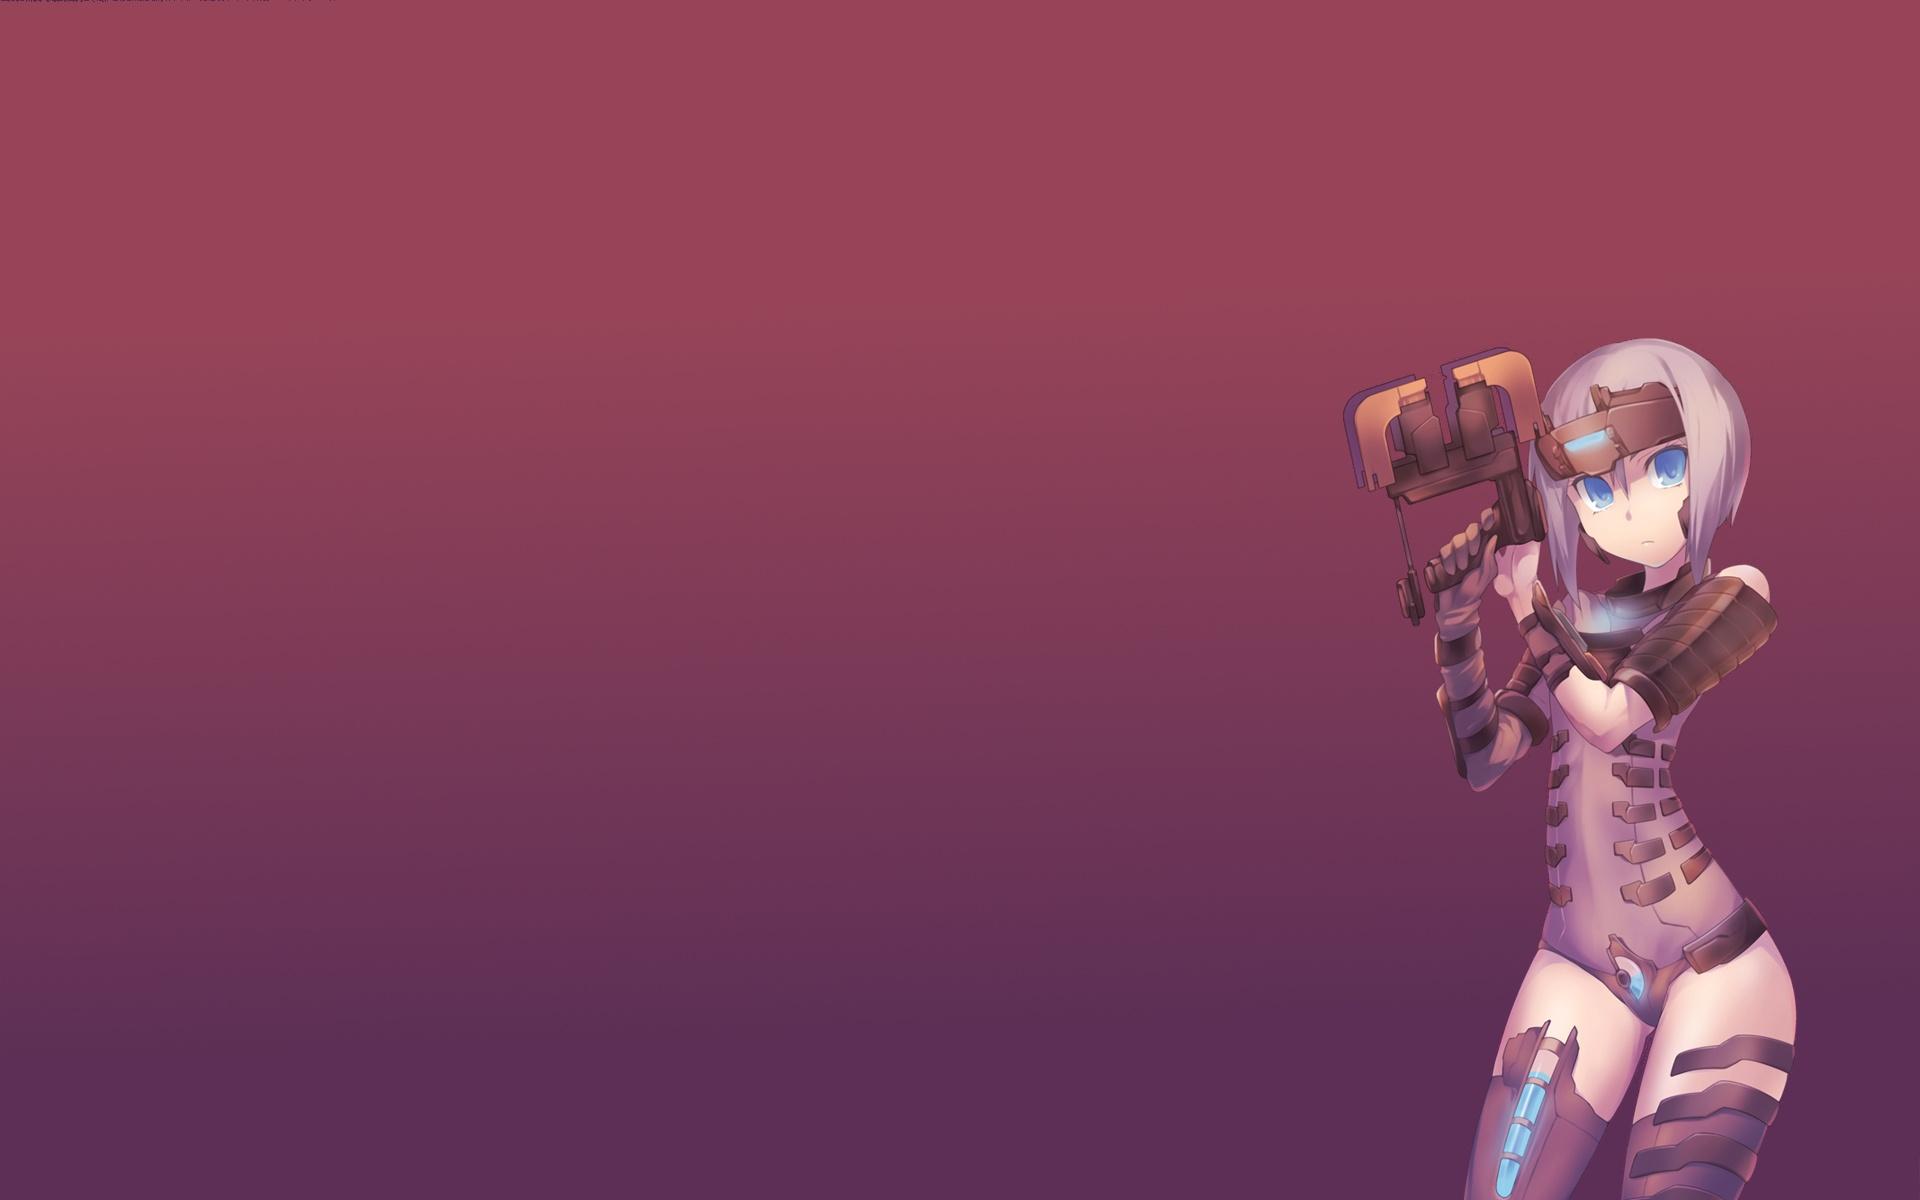 Girl Gun Desktop Wallpaper Dead Space Full Hd Wallpaper And Background Image